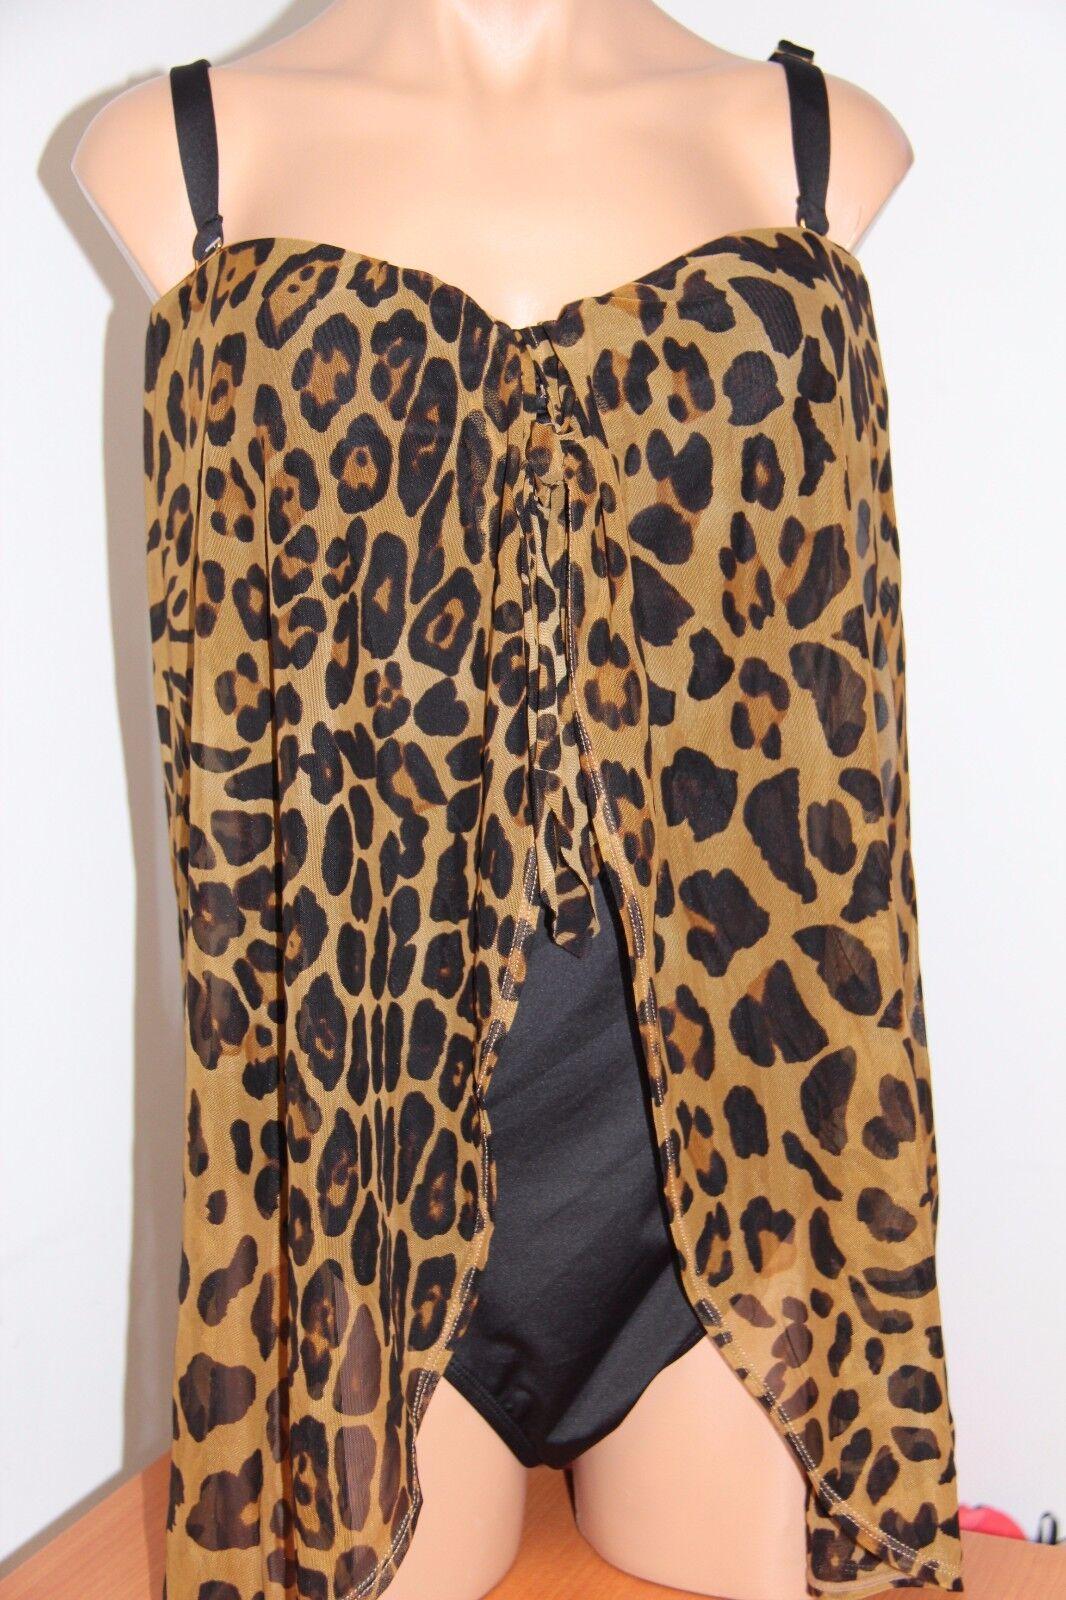 NWT Ralph Lauren Swimsuit Bikini 1 piece Fly Away Plus Size 20W BRO Leopard